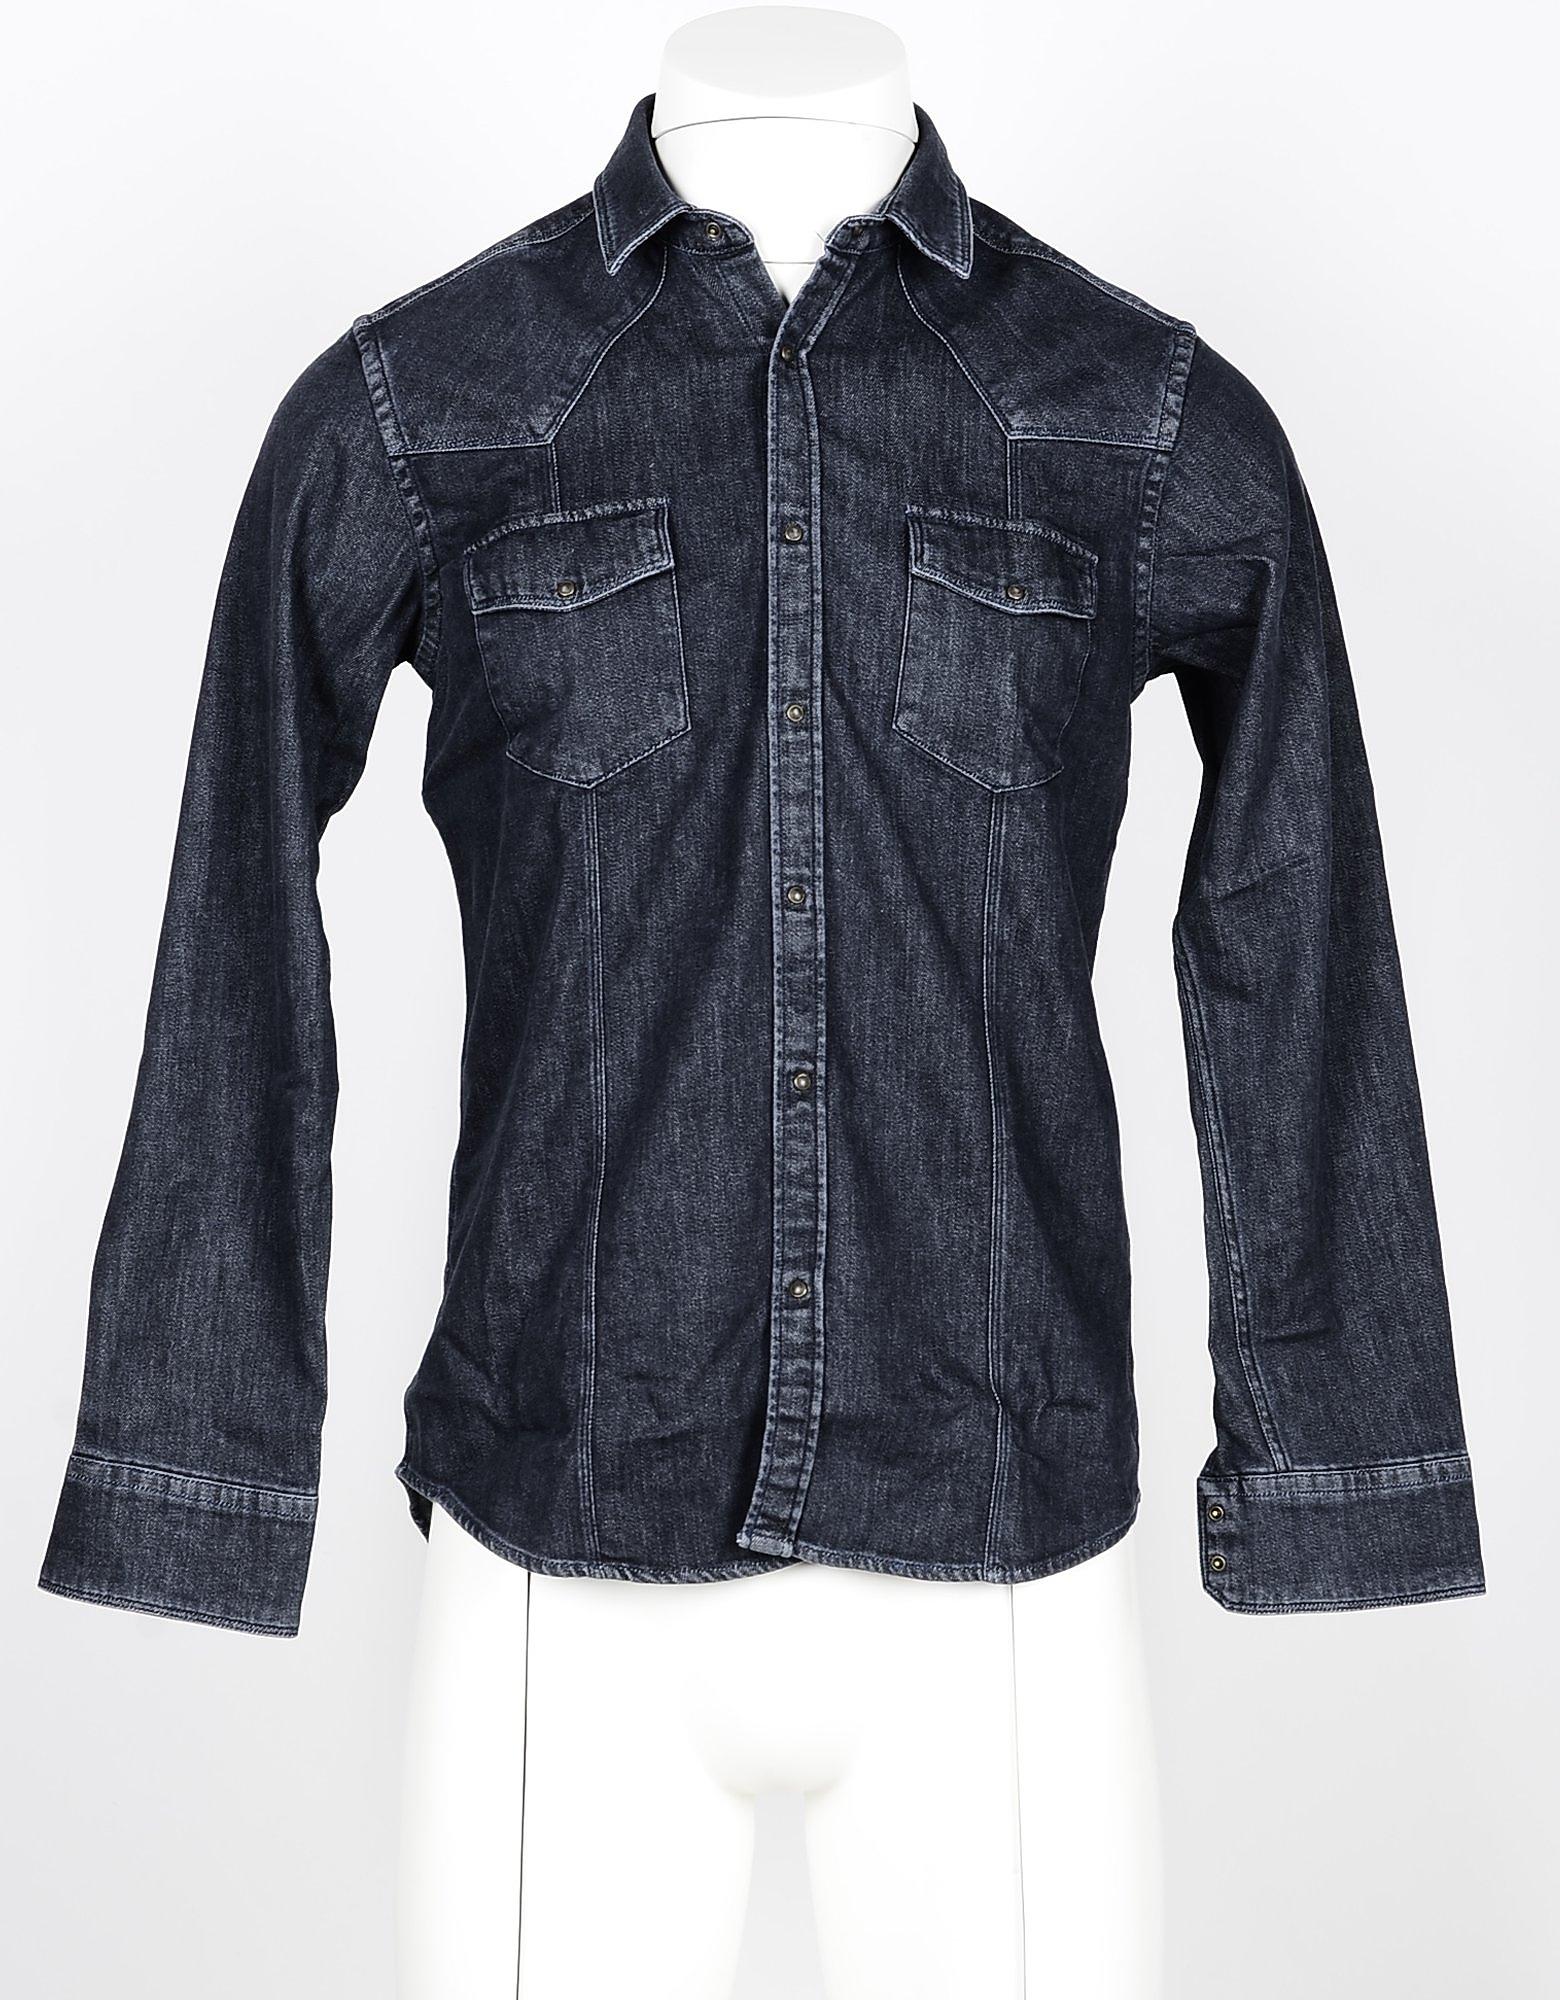 Messagerie Designer Shirts, Men's Black Shirt